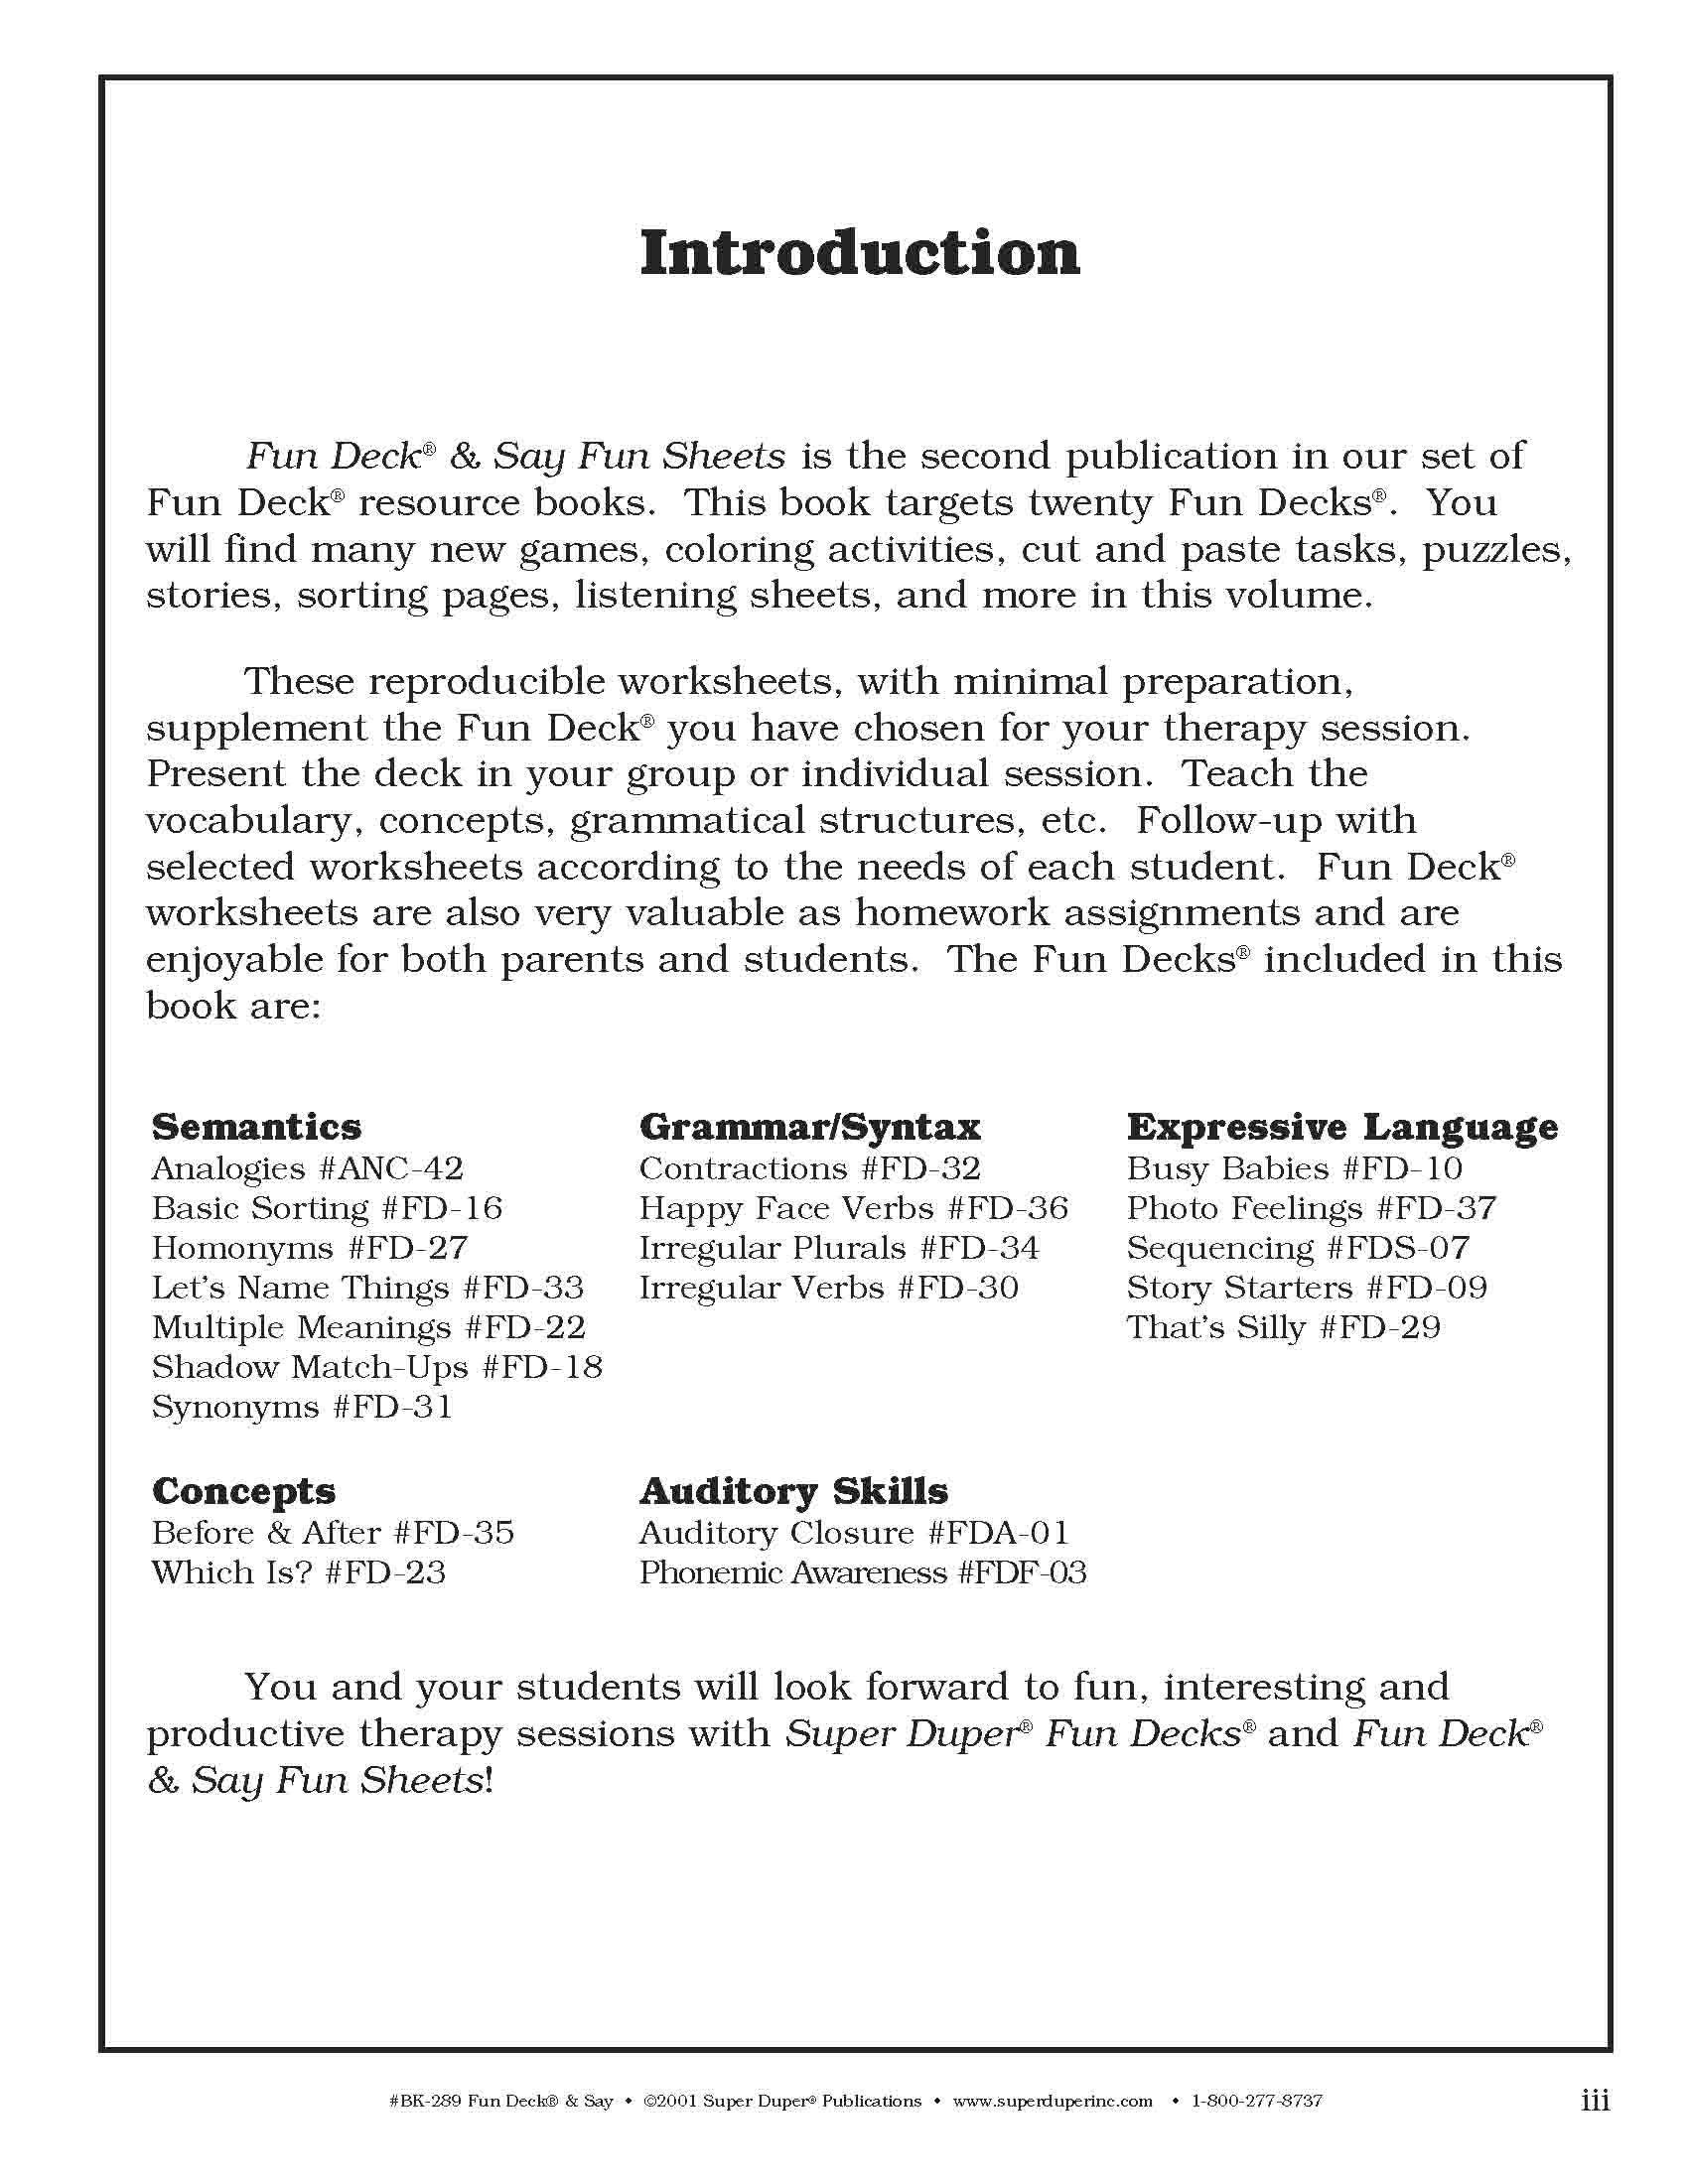 fun deck say grammar reasoning and semantics fun sheets for 20 super duper fun decks kim gill 9781586501891 amazoncom books